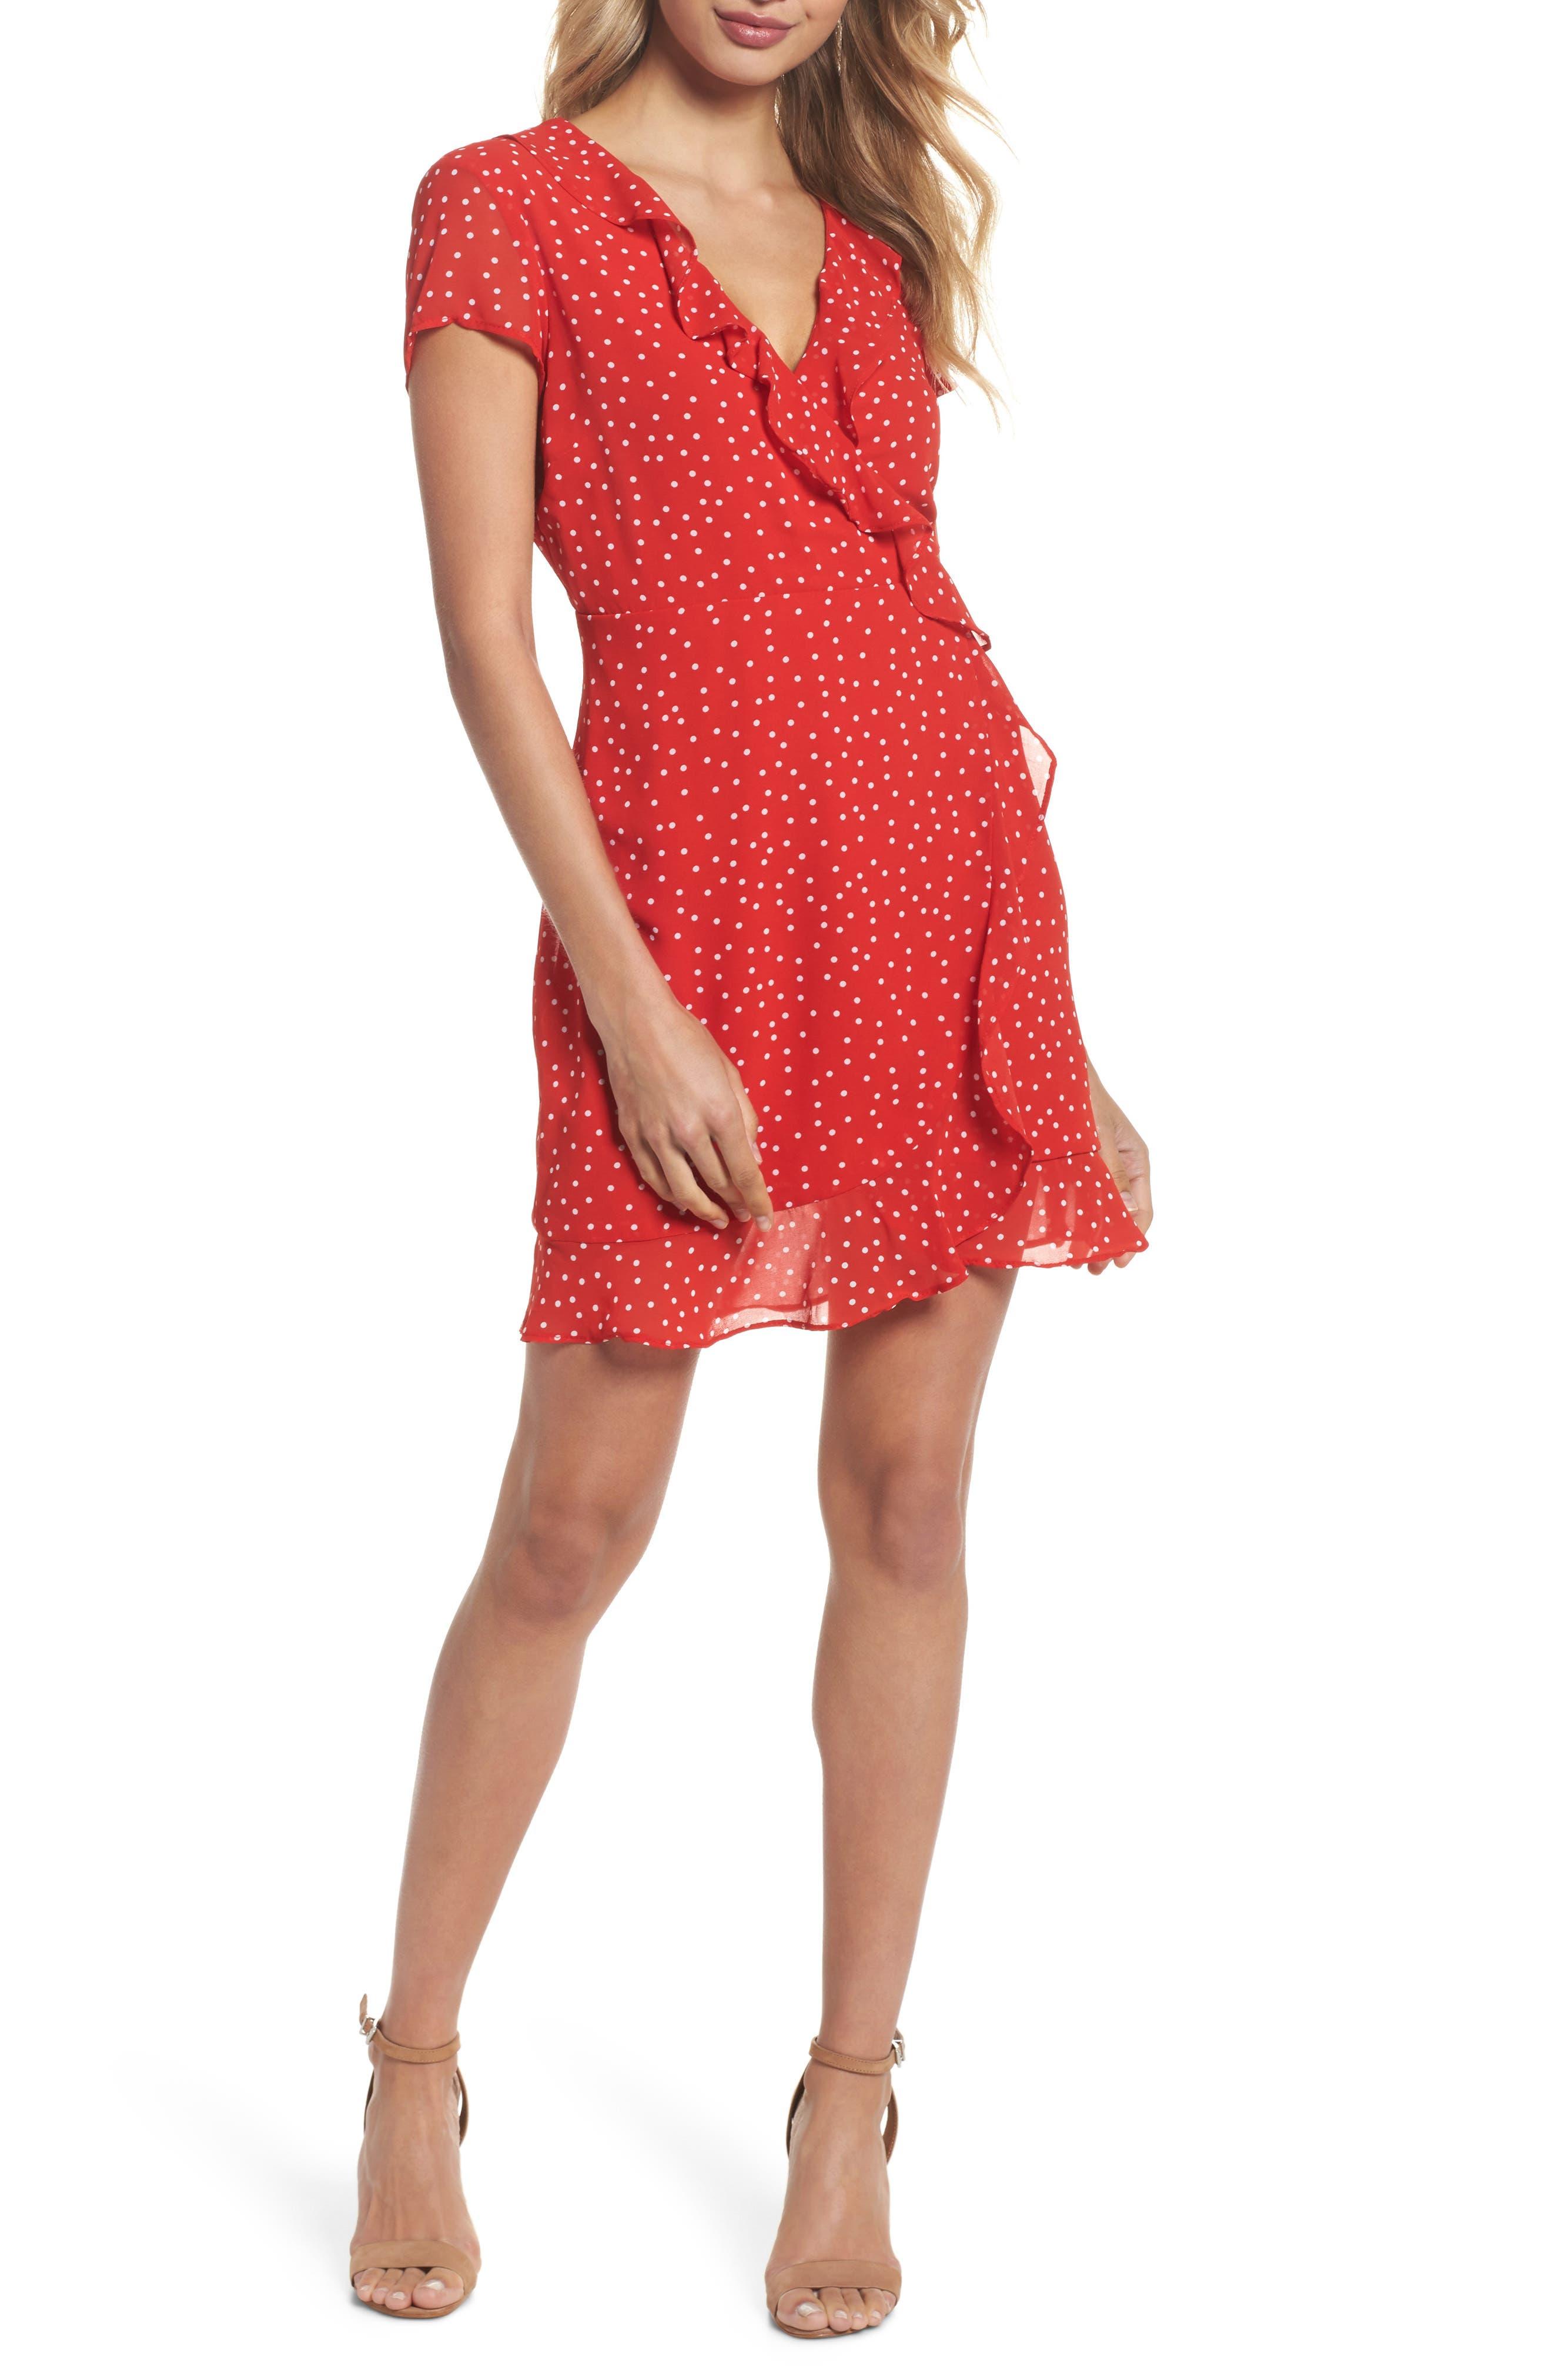 Alternate Image 1 Selected - Bardot Polka Dot Ruffle Dress